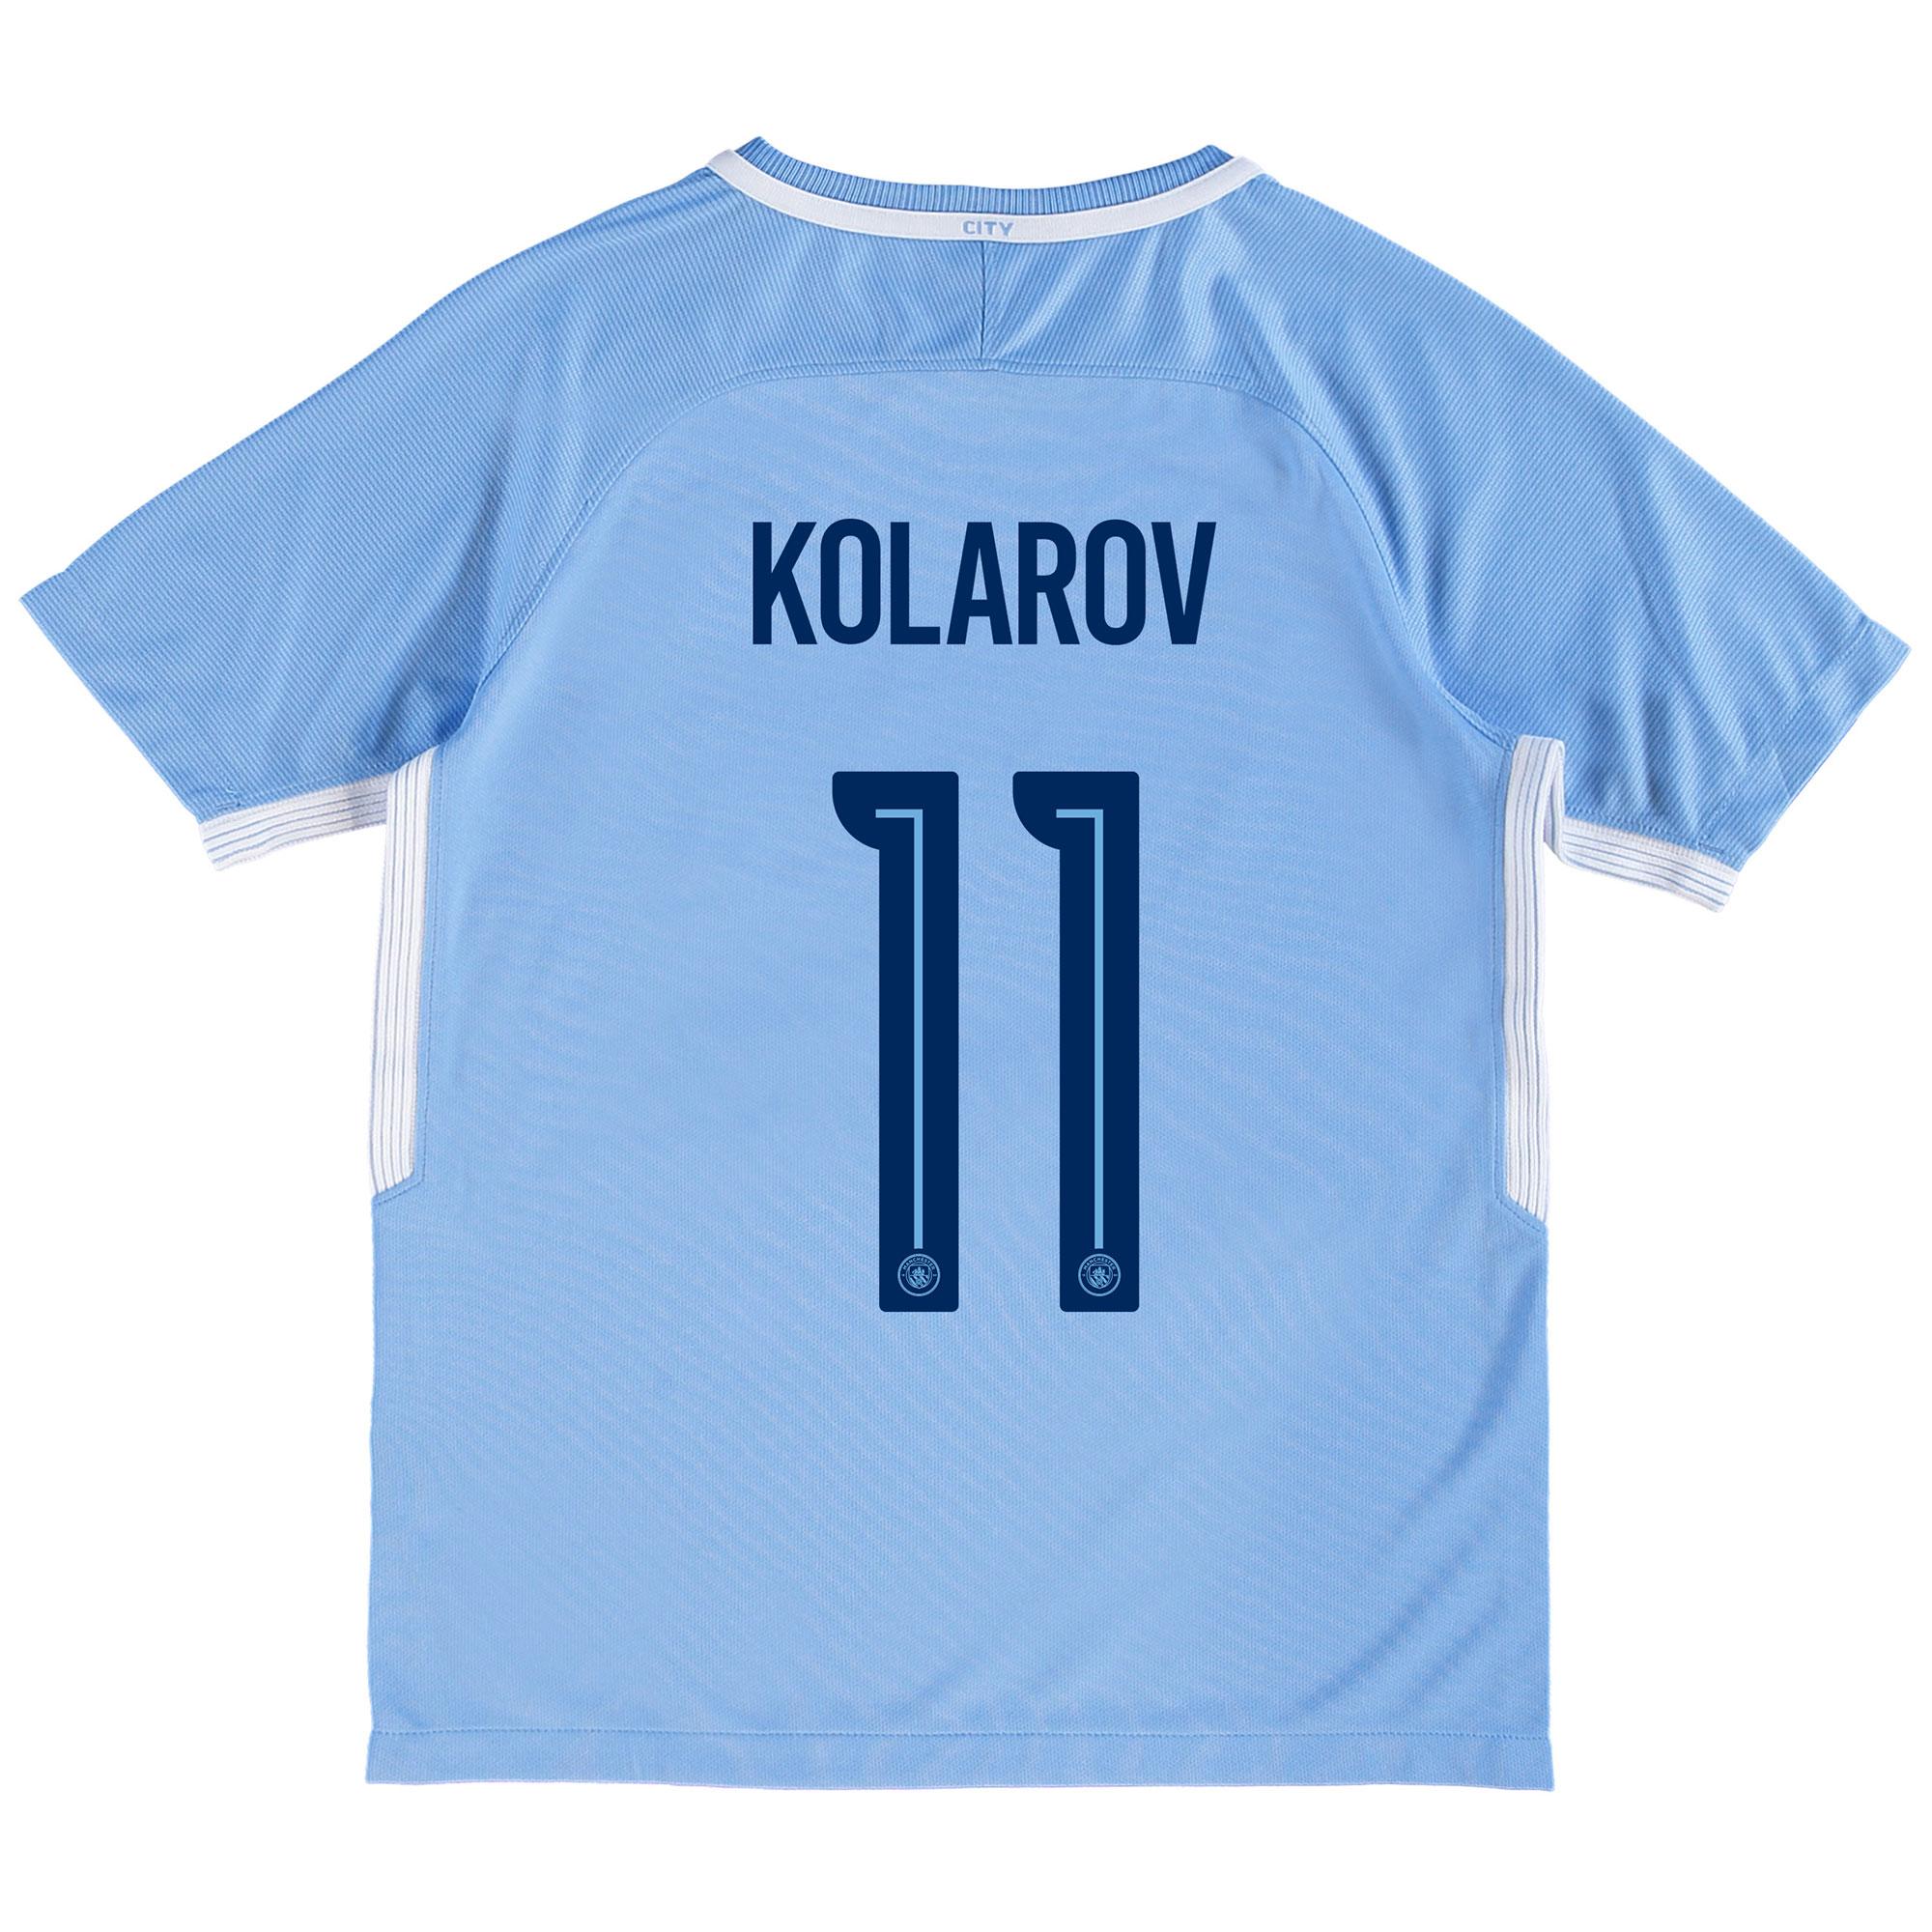 Manchester City Home Stadium Cup Shirt 2017-18 - Kids with Kolarov 11